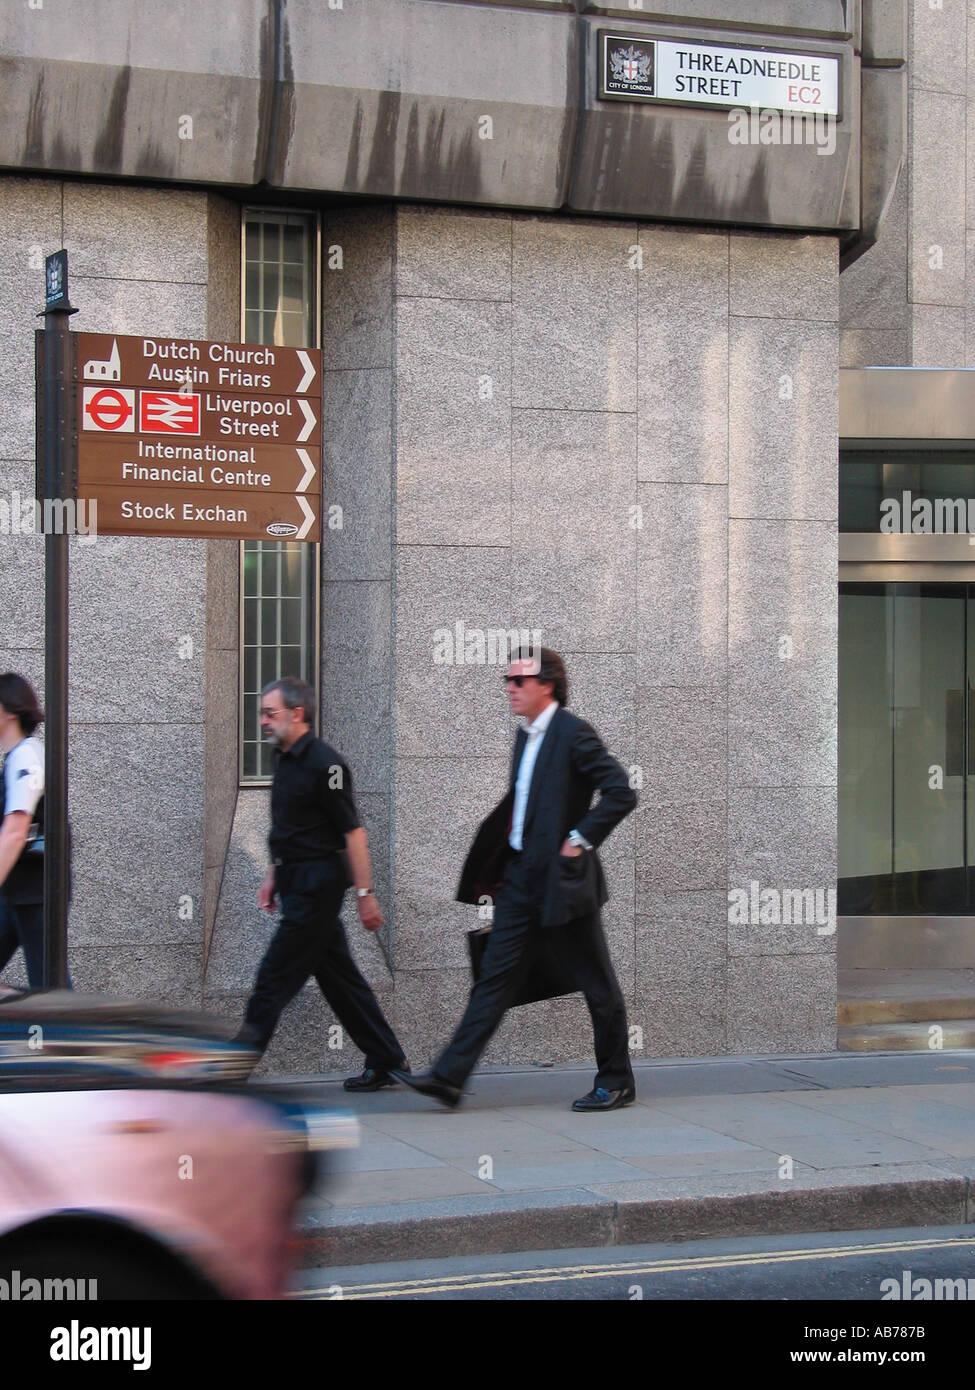 City Workers Banking Area Threadneedle Street EC2 City of London Street Sign London GB - Stock Image